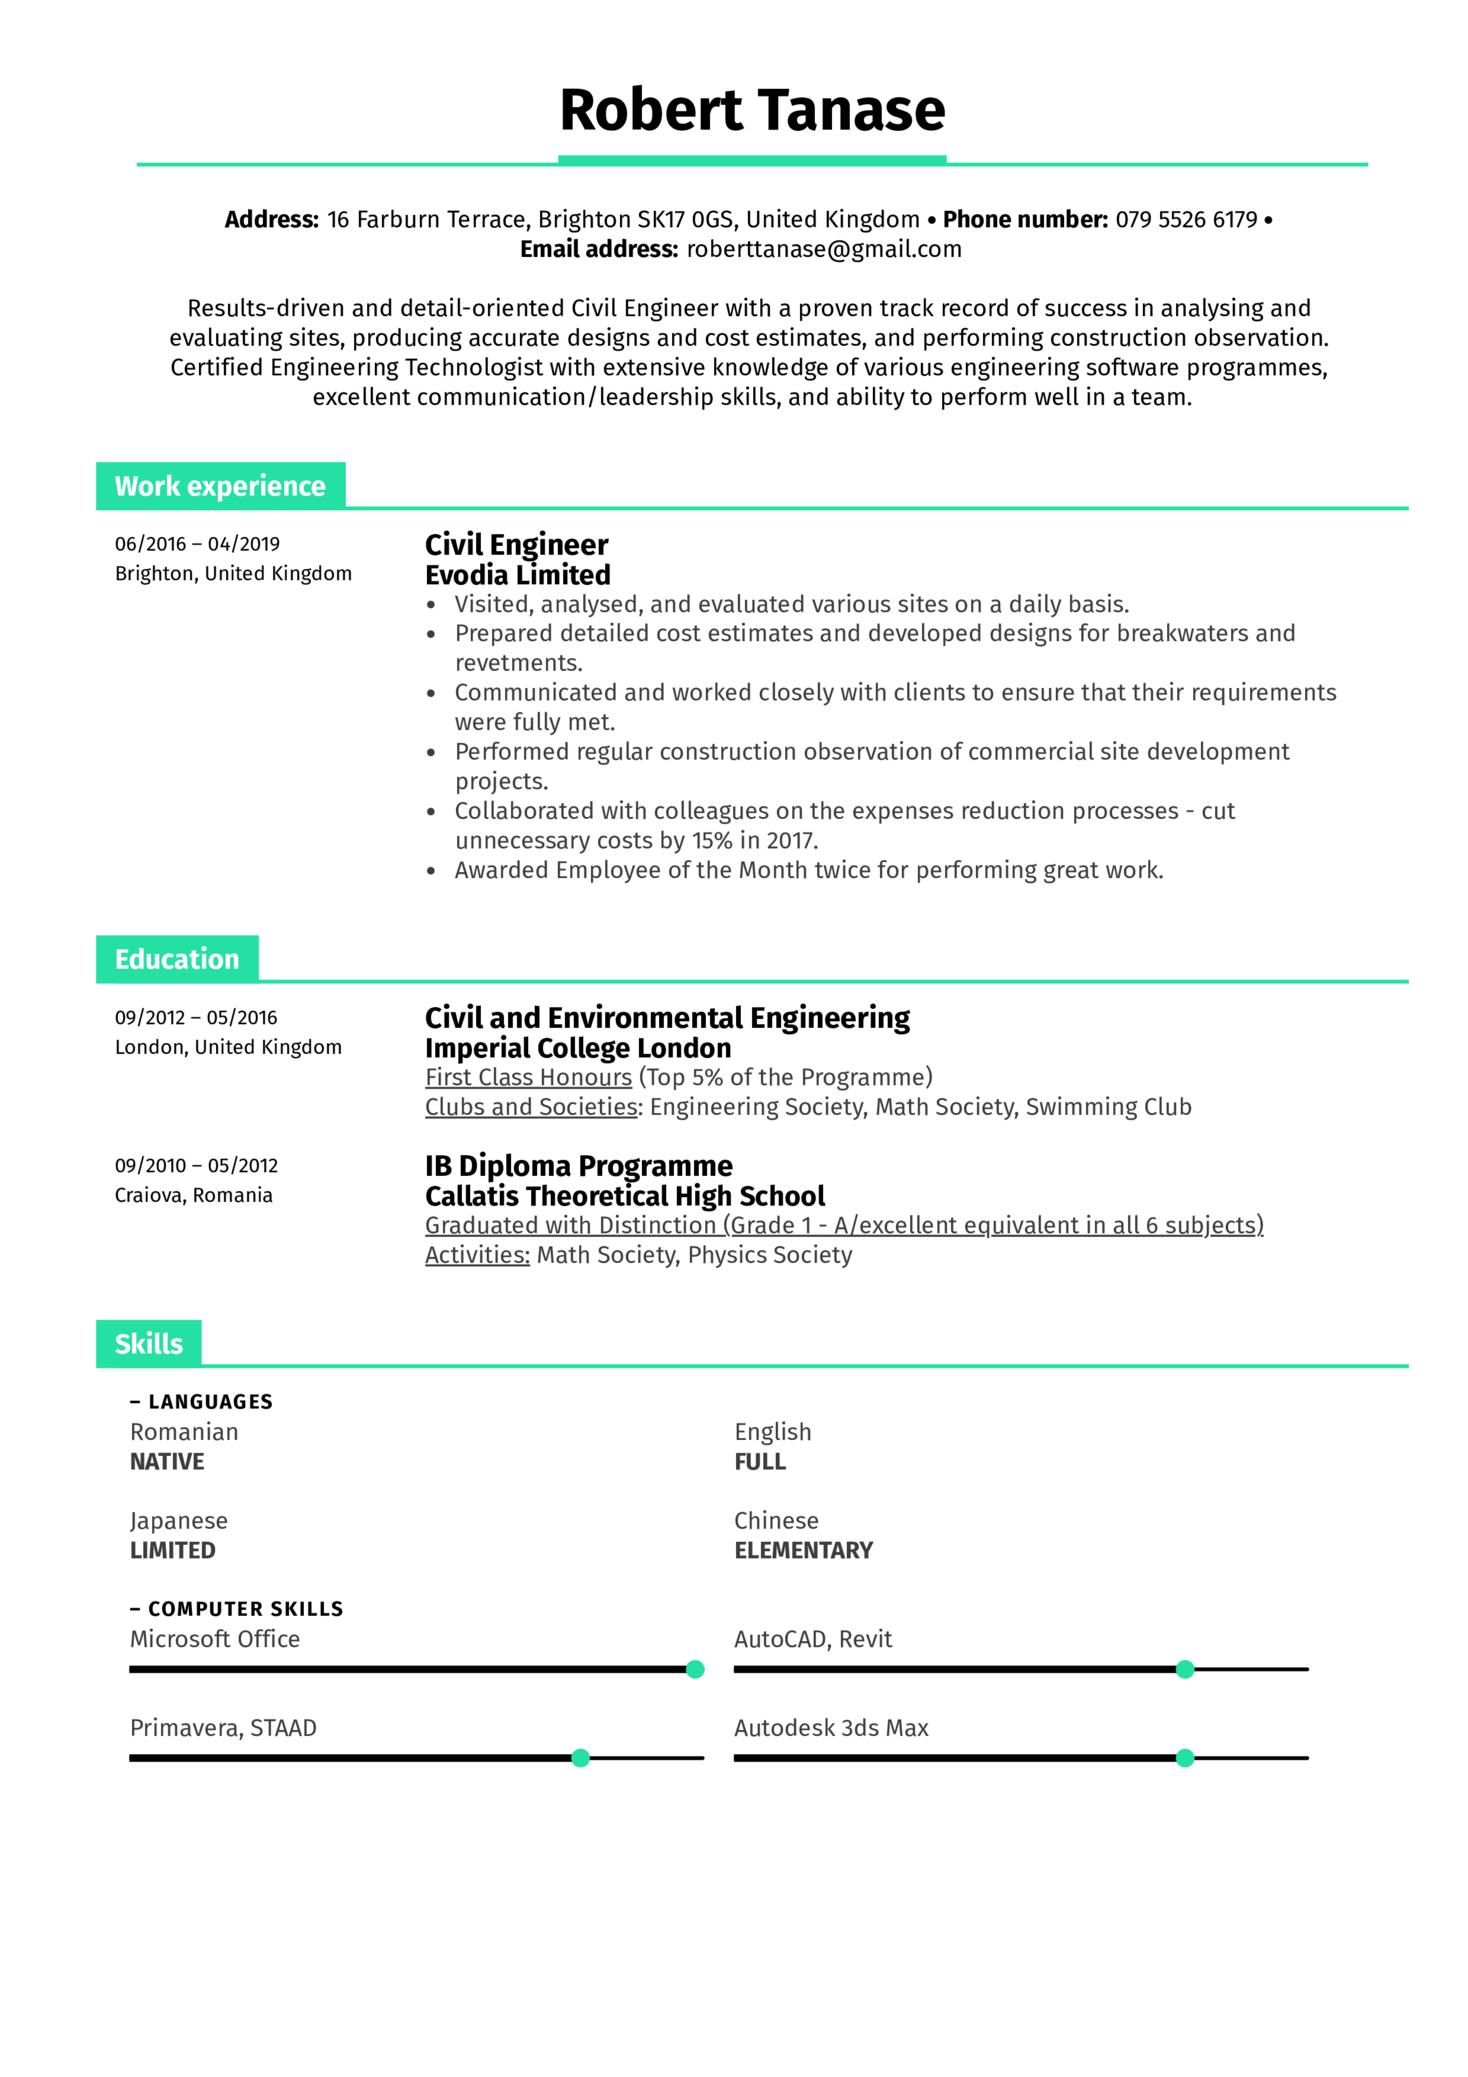 Civil Engineer Resume Example (Part 1)